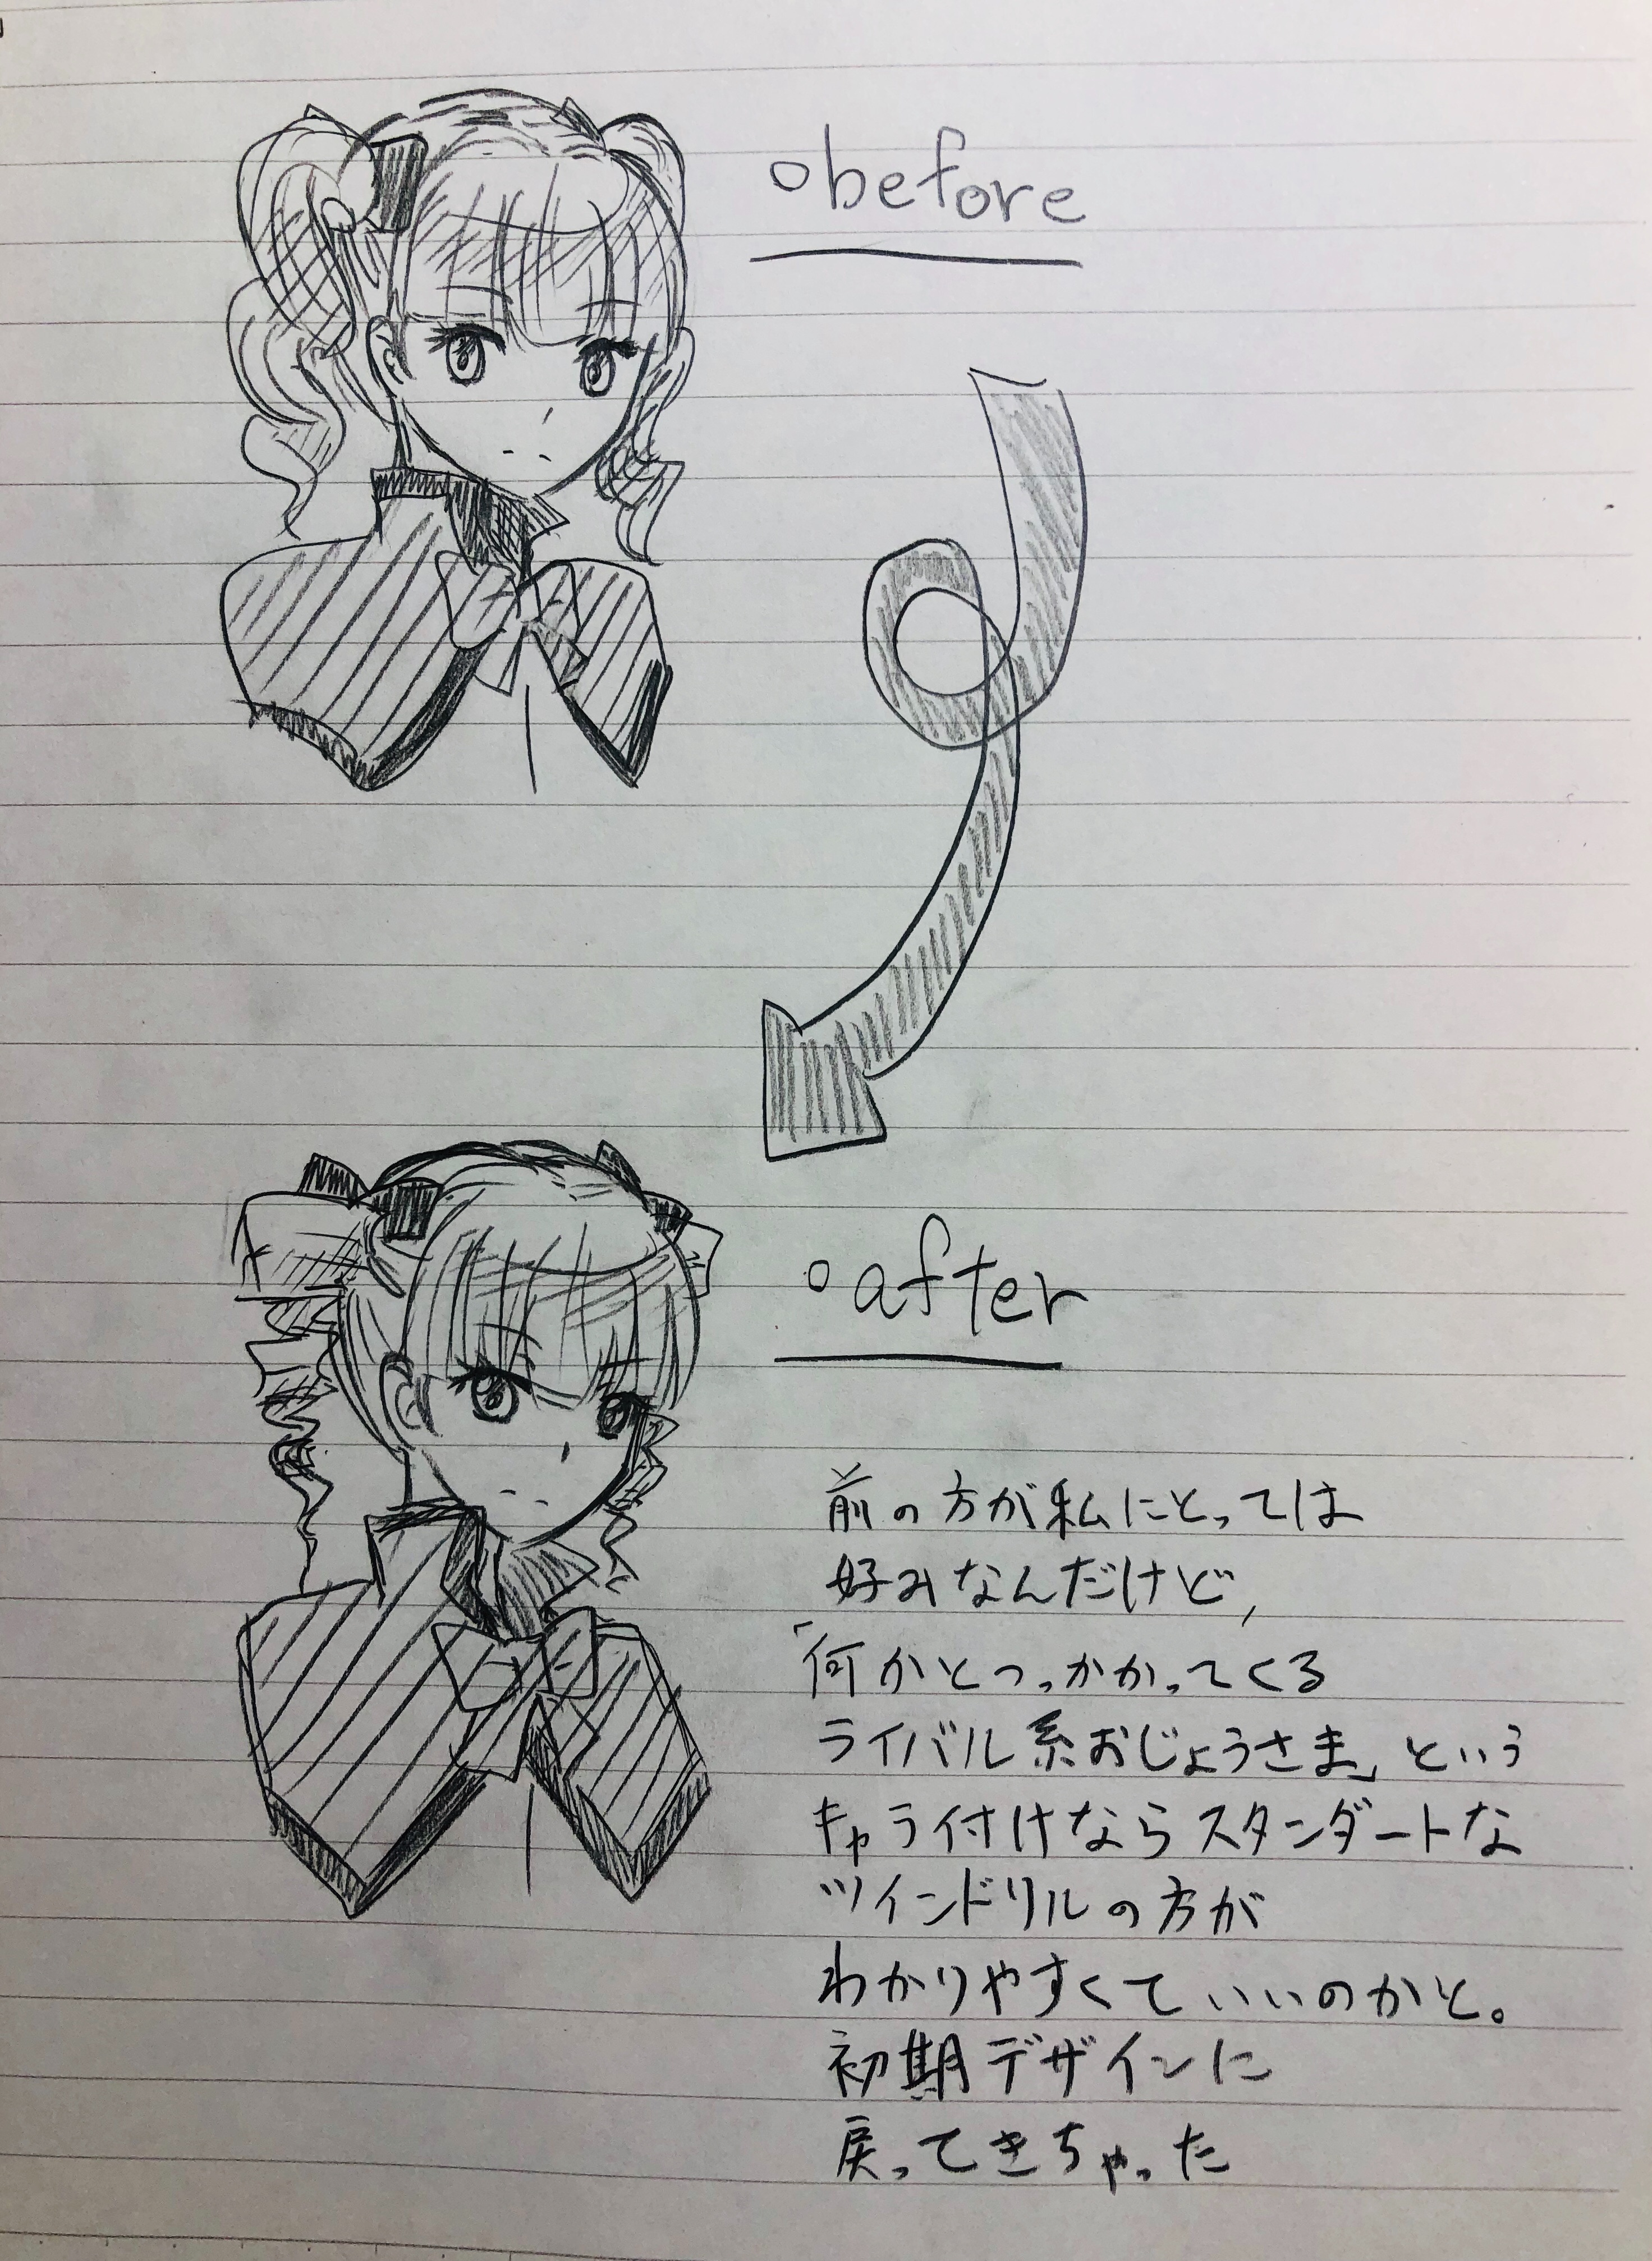 f:id:Yuki-19:20200407094252j:image